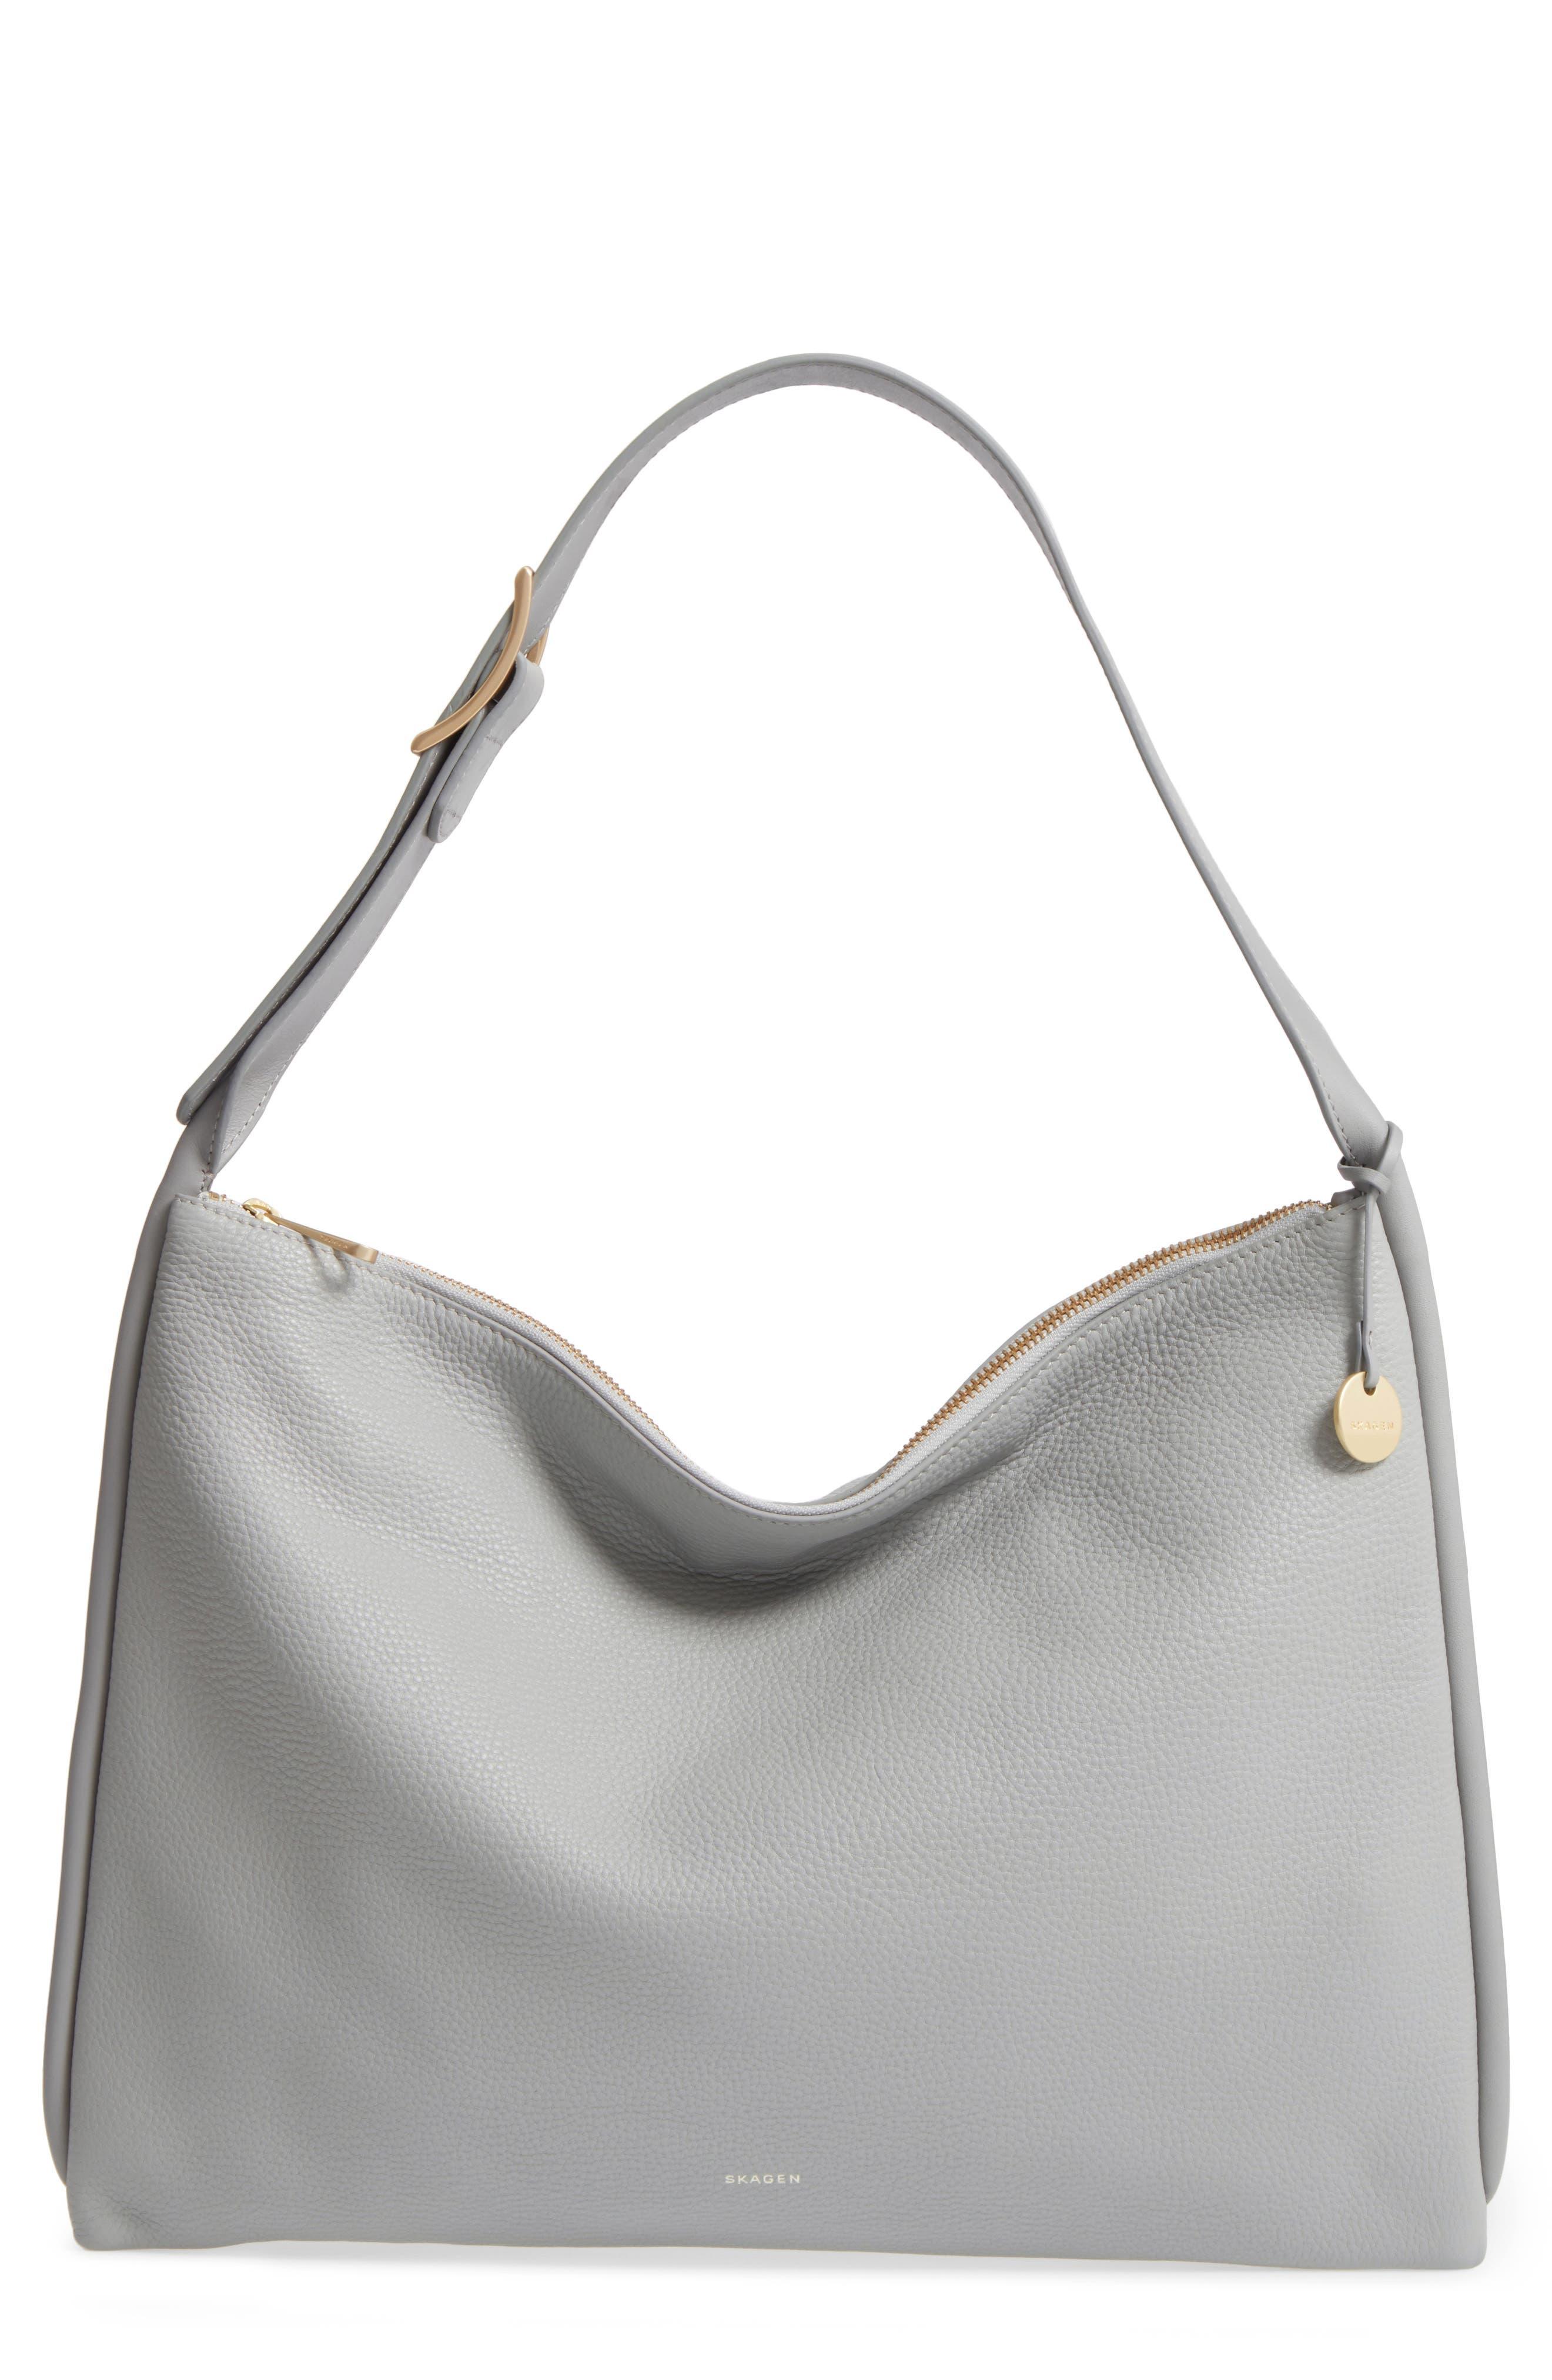 Anesa Leather Shoulder Bag,                             Main thumbnail 1, color,                             022